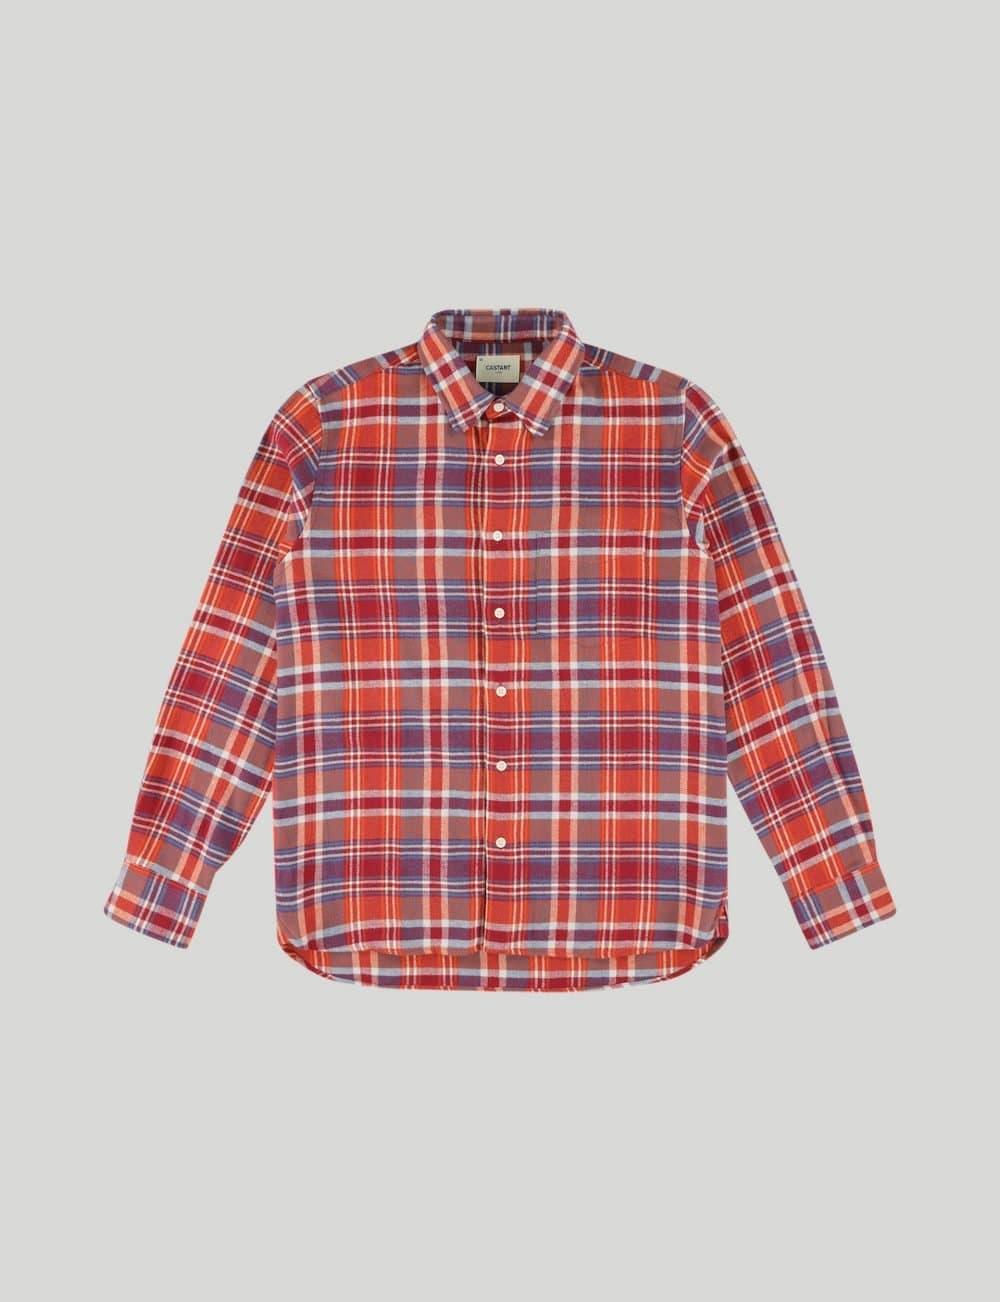 Castart - King Oyster Cot Shirt - Red